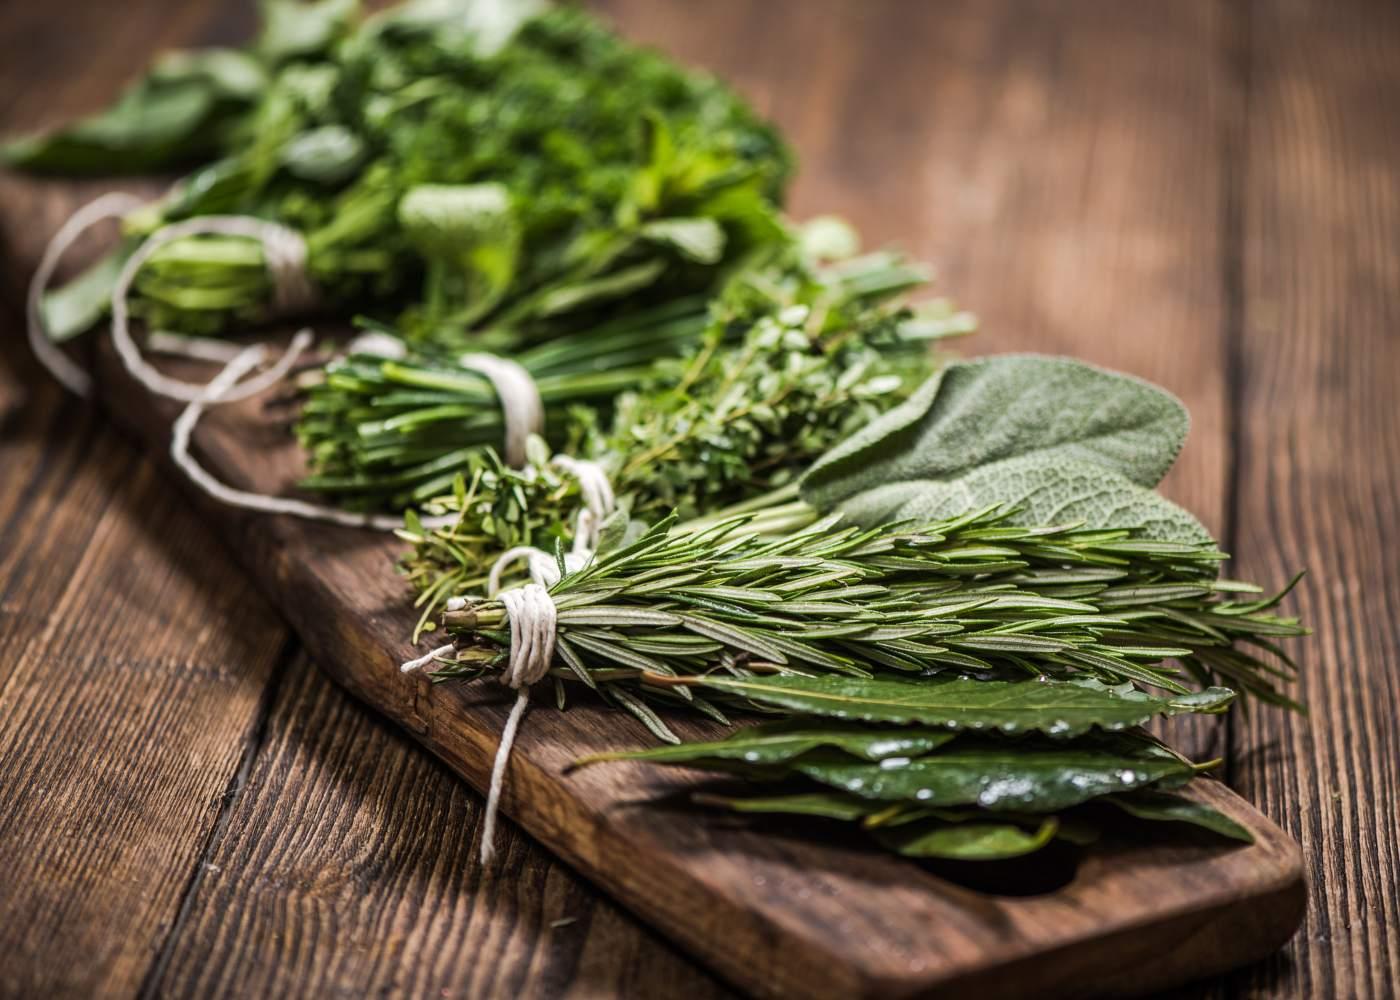 Ervas aromáticas saudáveis